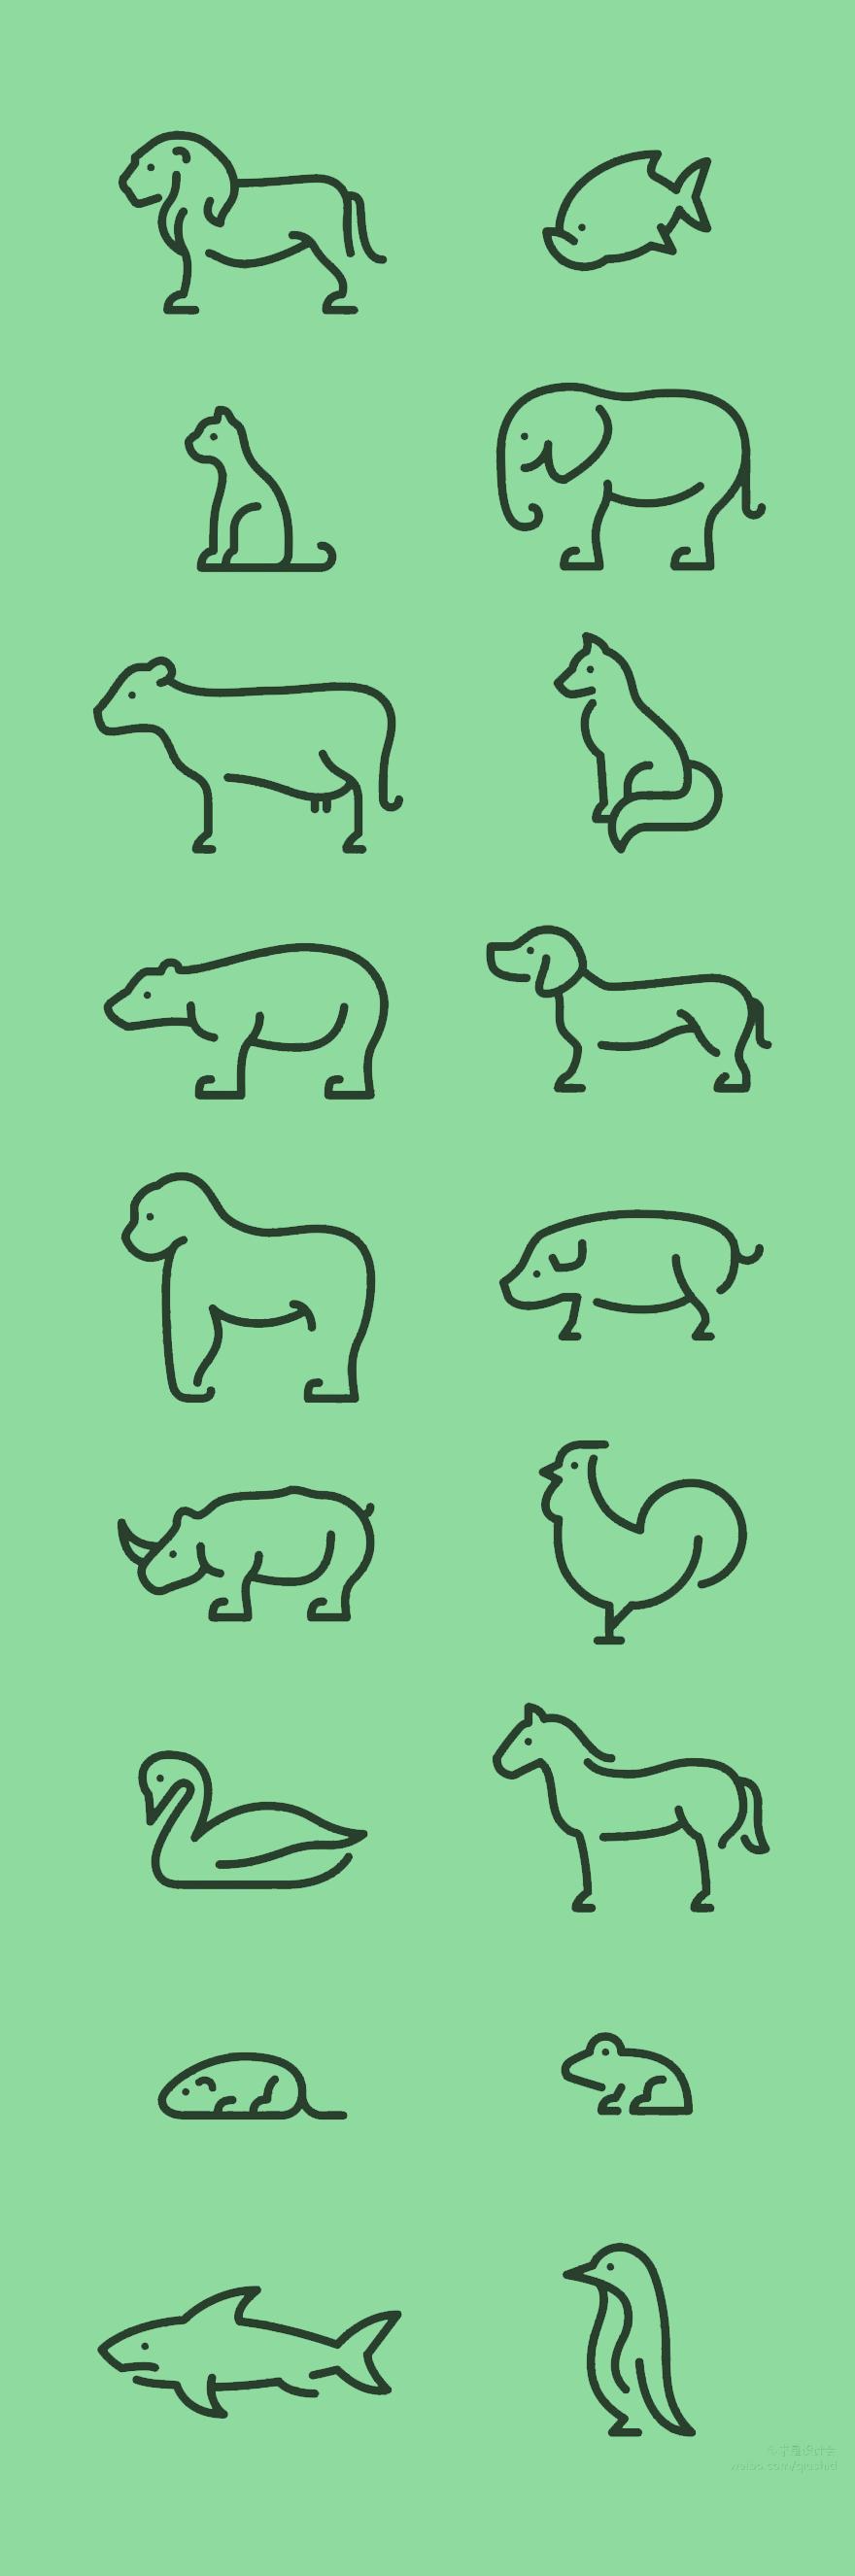 A brilliant case of using symbols in architecture beautiful animals little tattoo idea rhino or elephant buycottarizona Choice Image